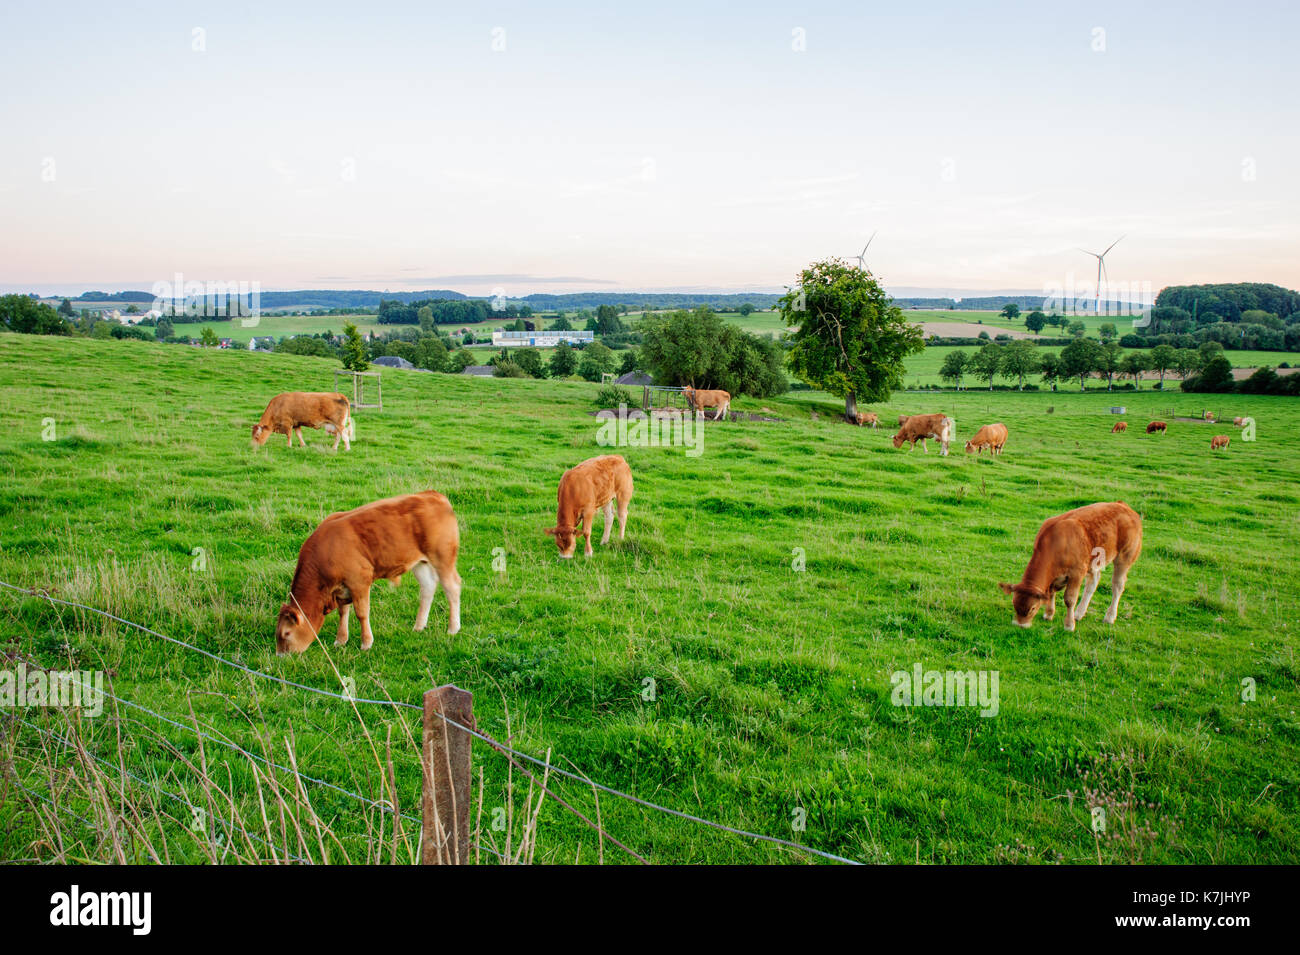 herd eating grass stock photos u0026 herd eating grass stock images